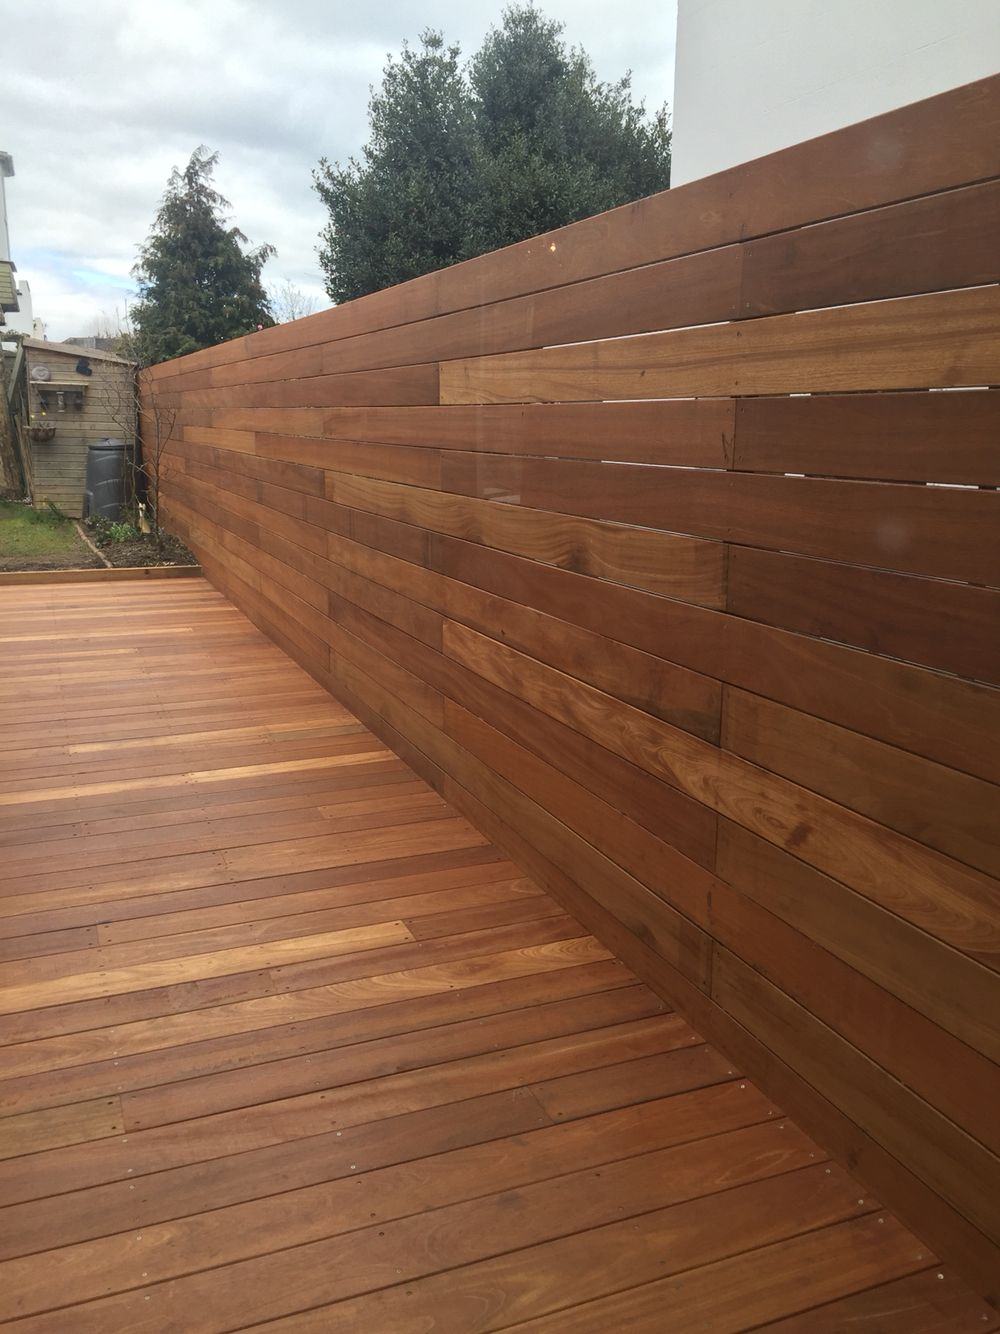 Horizontal Wood Fence Yellow Balau Deck Boards Finished With